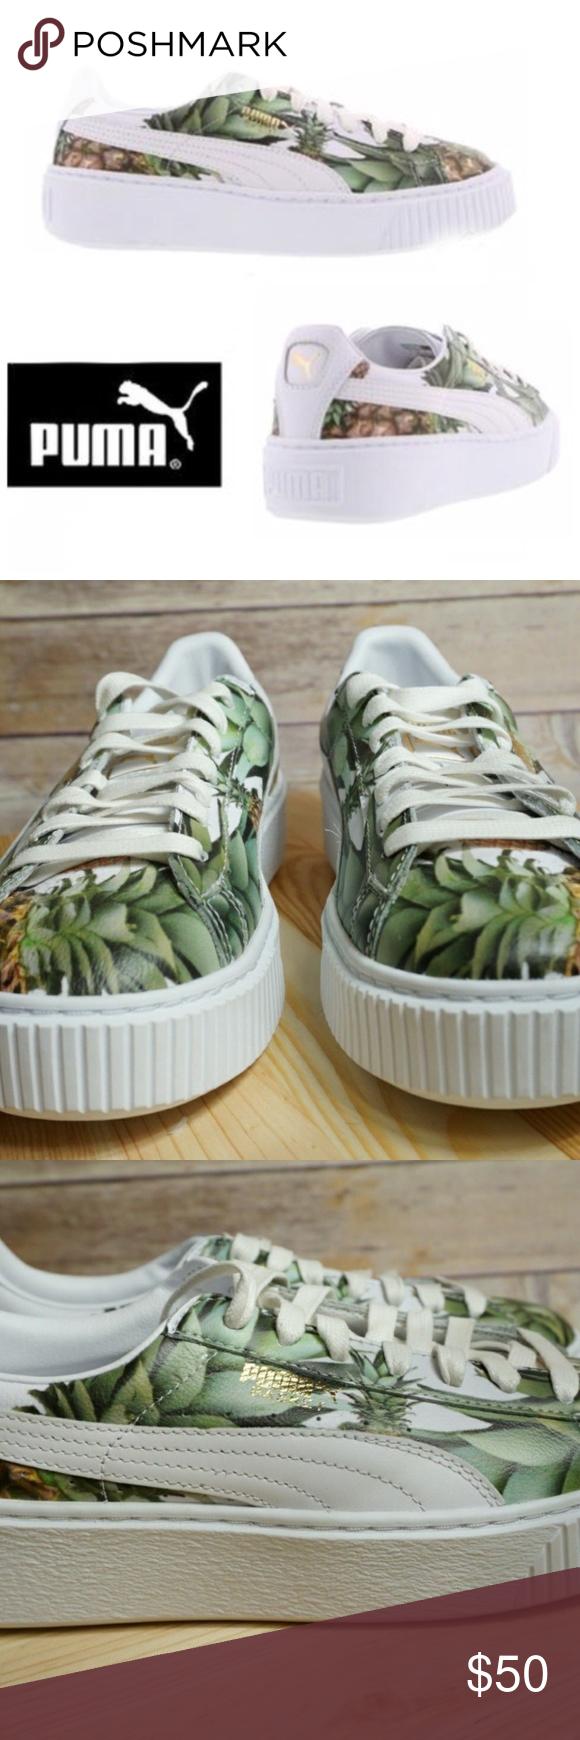 Puma Platform Pineapple White Sneakers Size 8.5   White